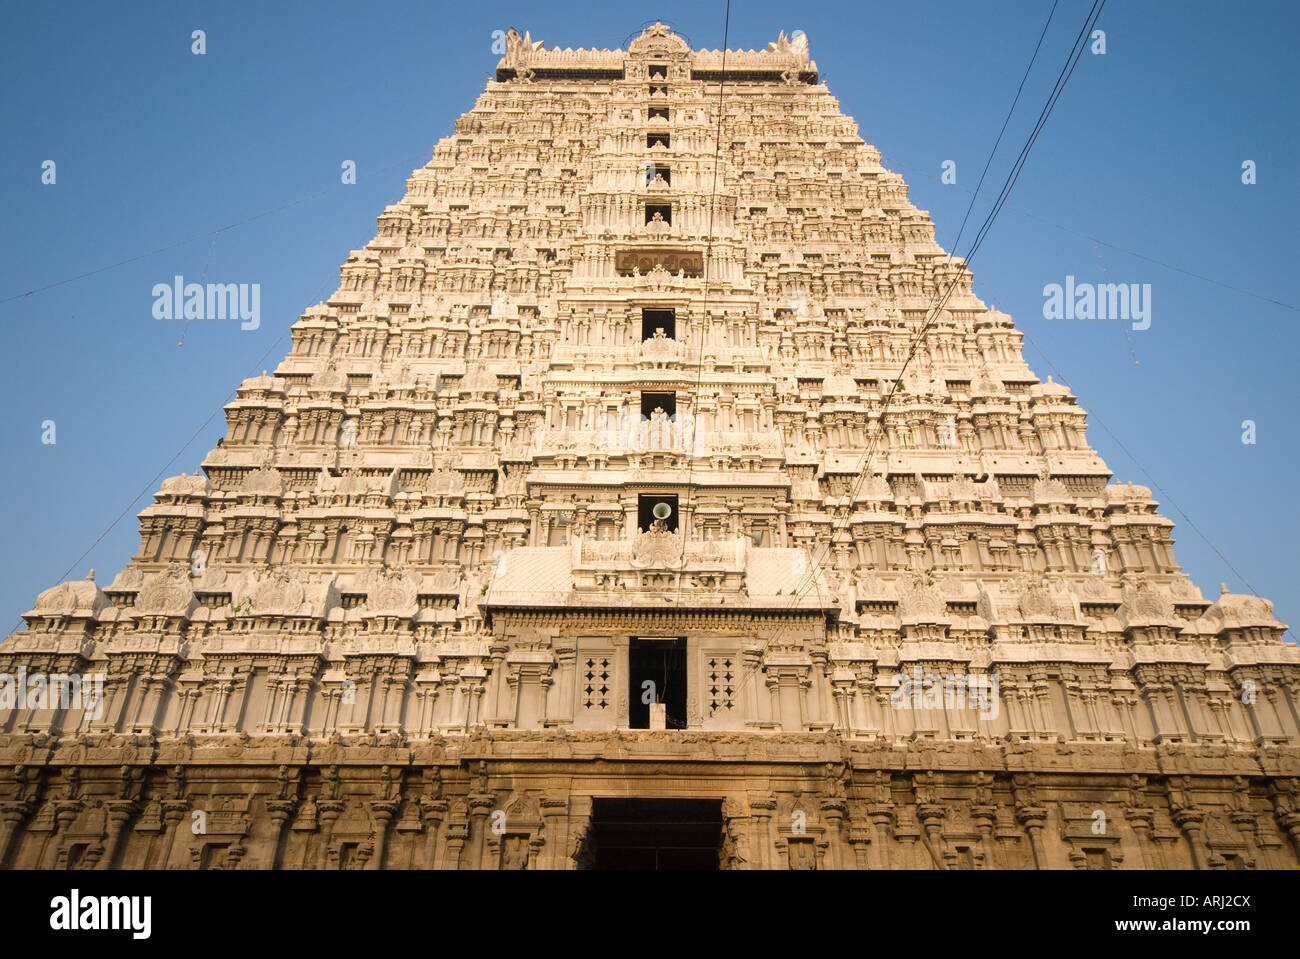 The large gopuram which is 66 metres high at Arunachaleswarer Temple in Tiruvannamalai Tamil Nadu India - Stock Image